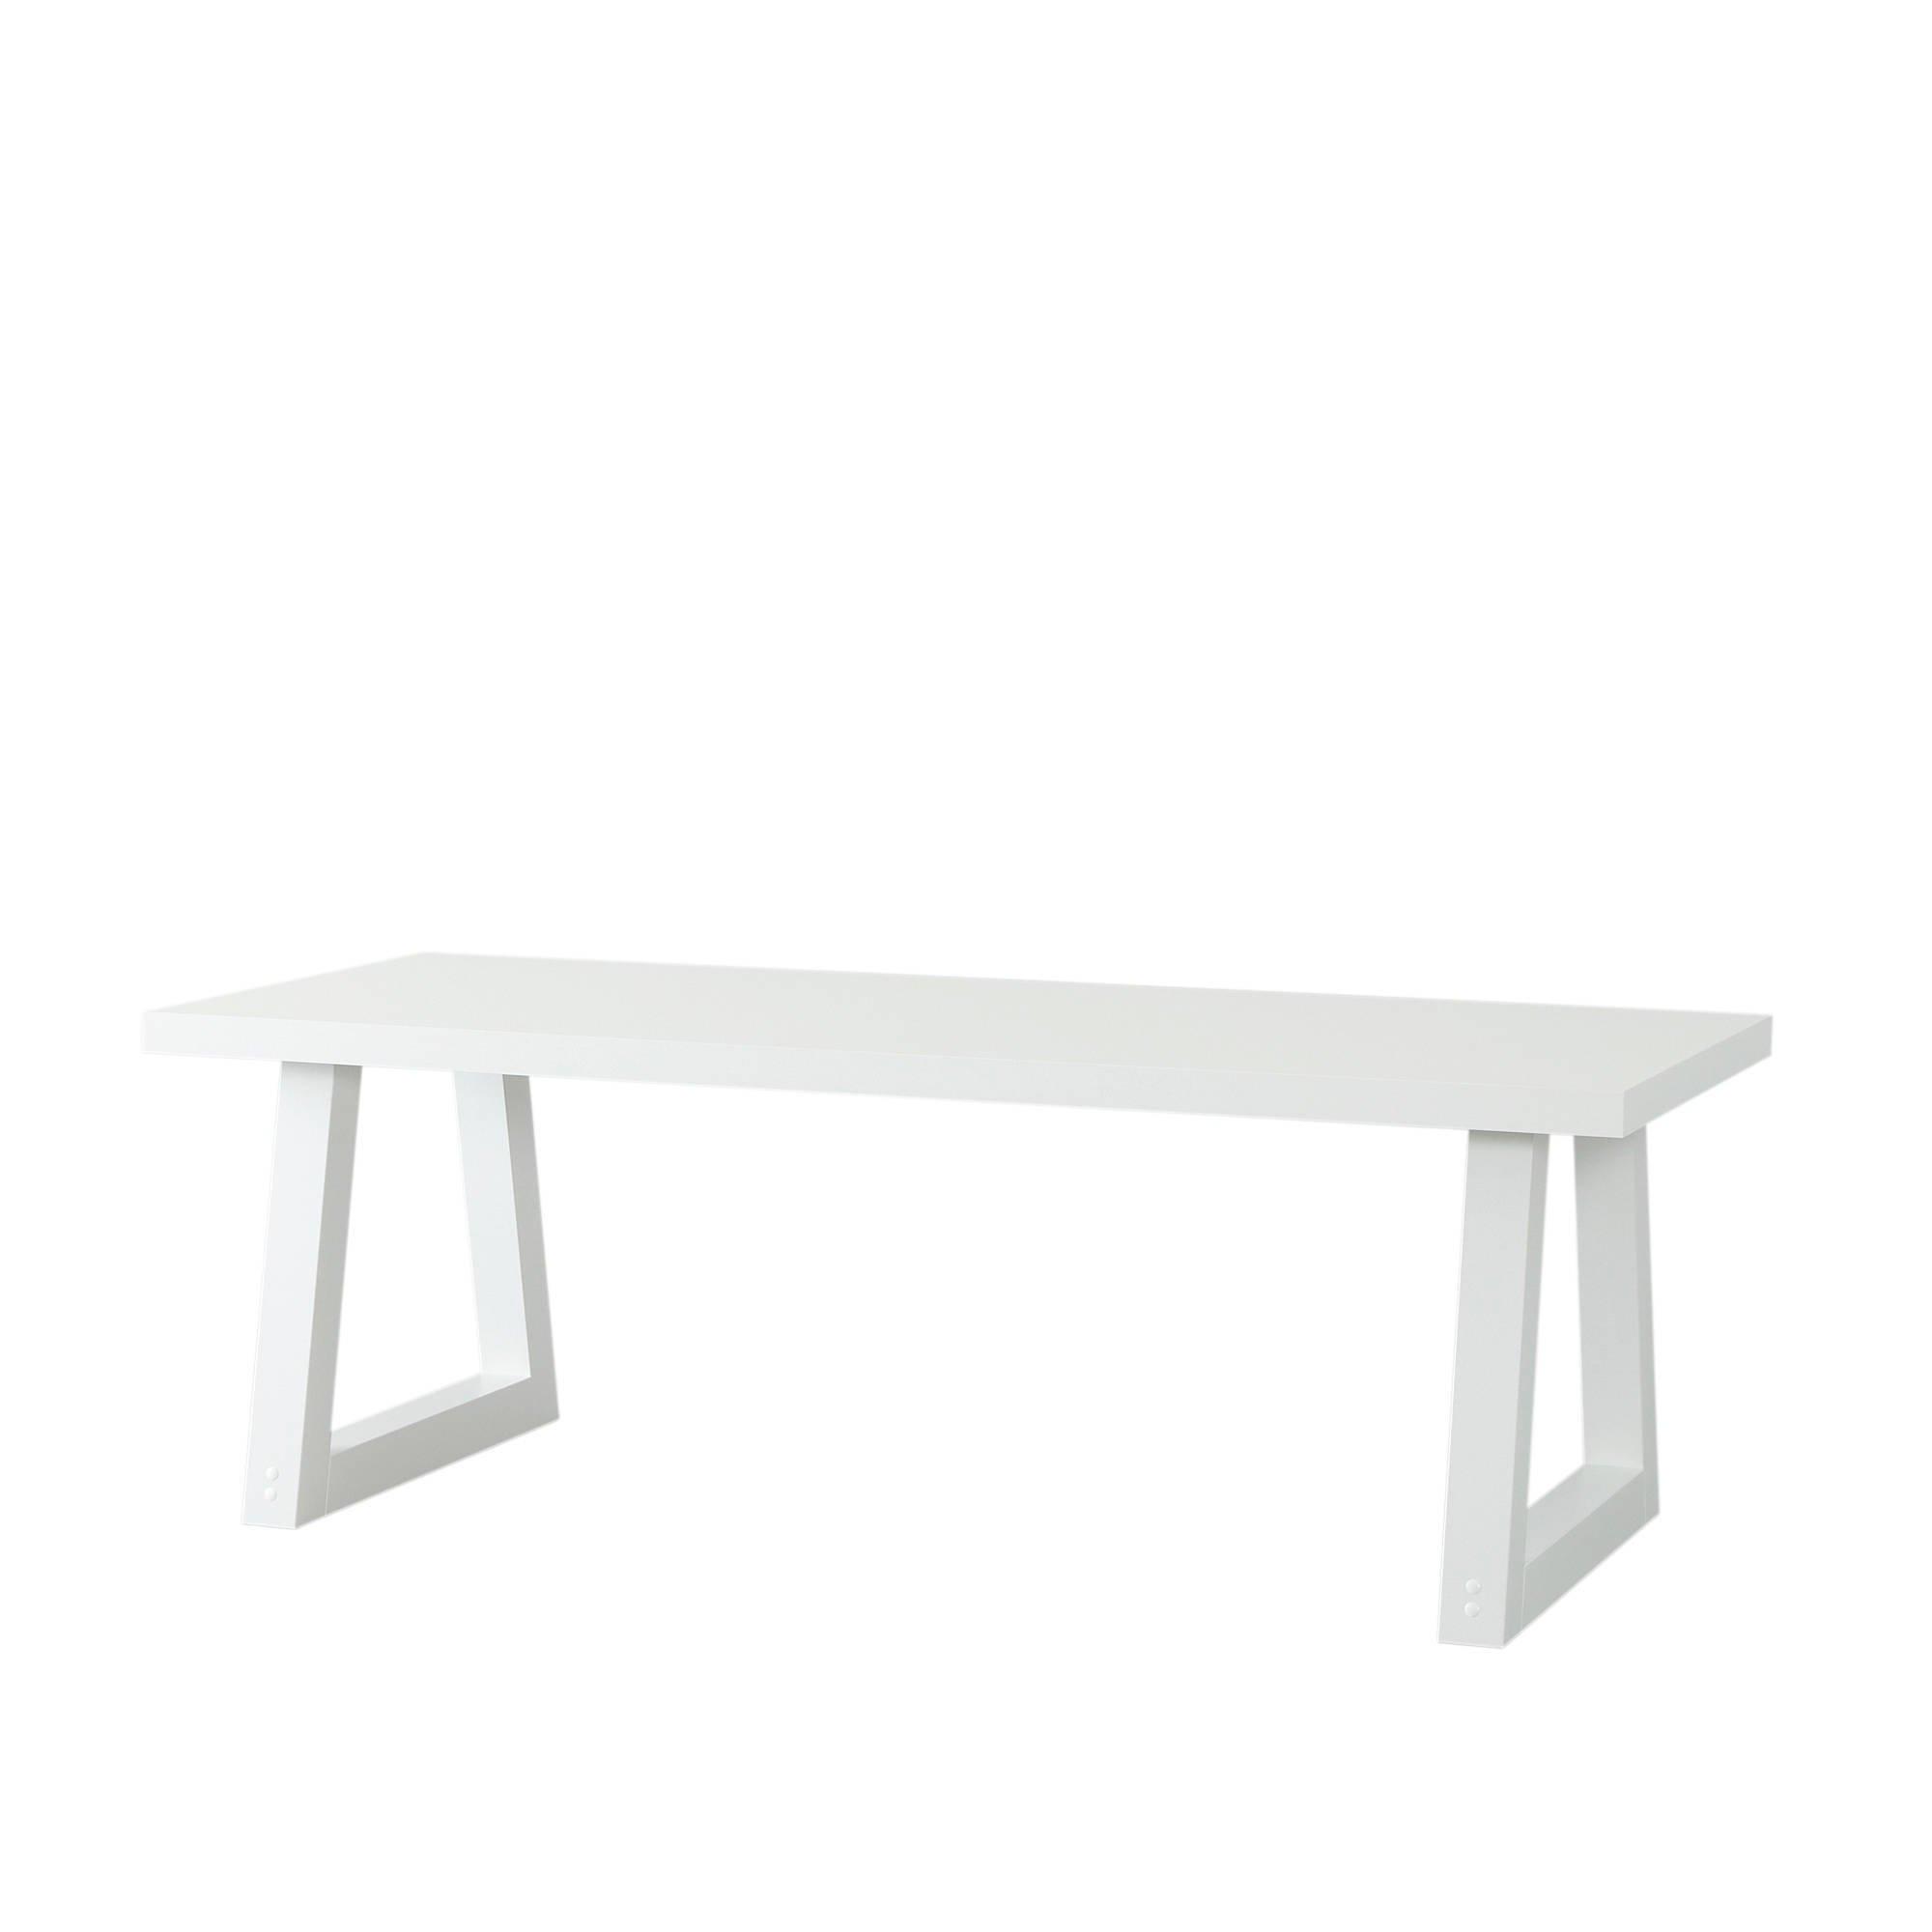 Witte Eettafel 220 Cm.Whkmp S Own Eetkamertafel Bronx 220 Cm Wit Wehkamp